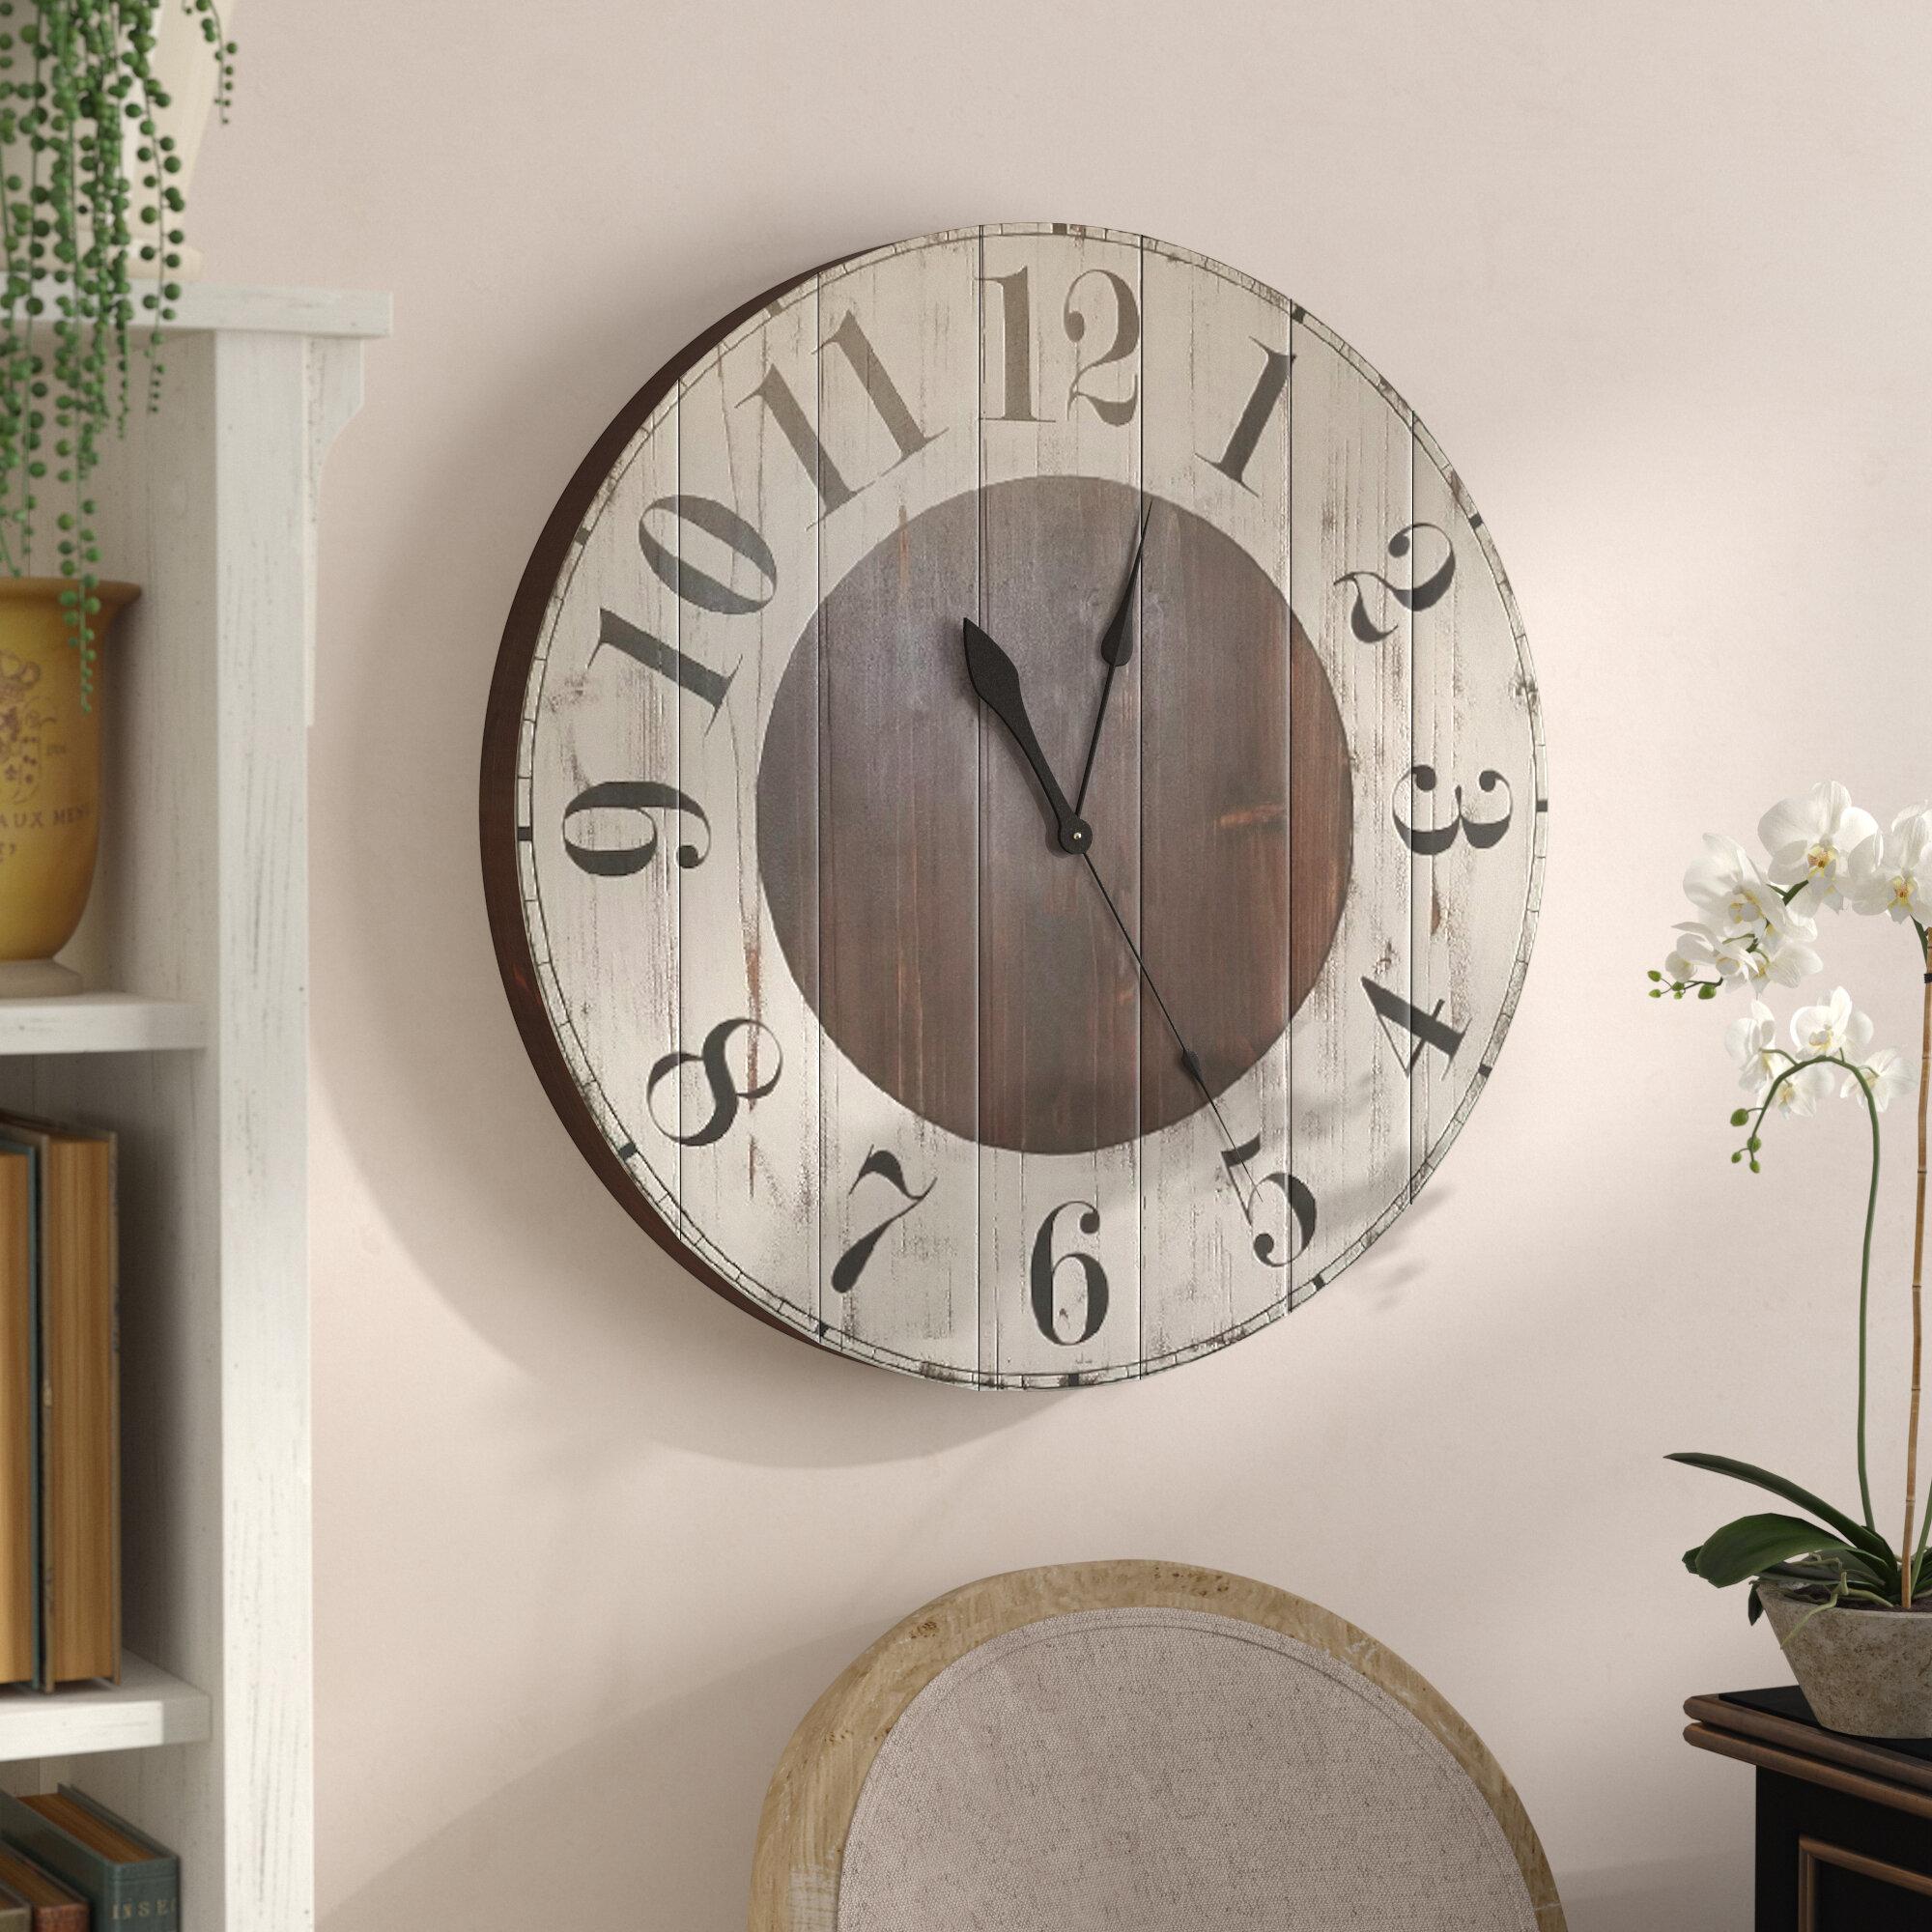 Oversized Wall Clocks You Ll Love In 2021 Wayfair